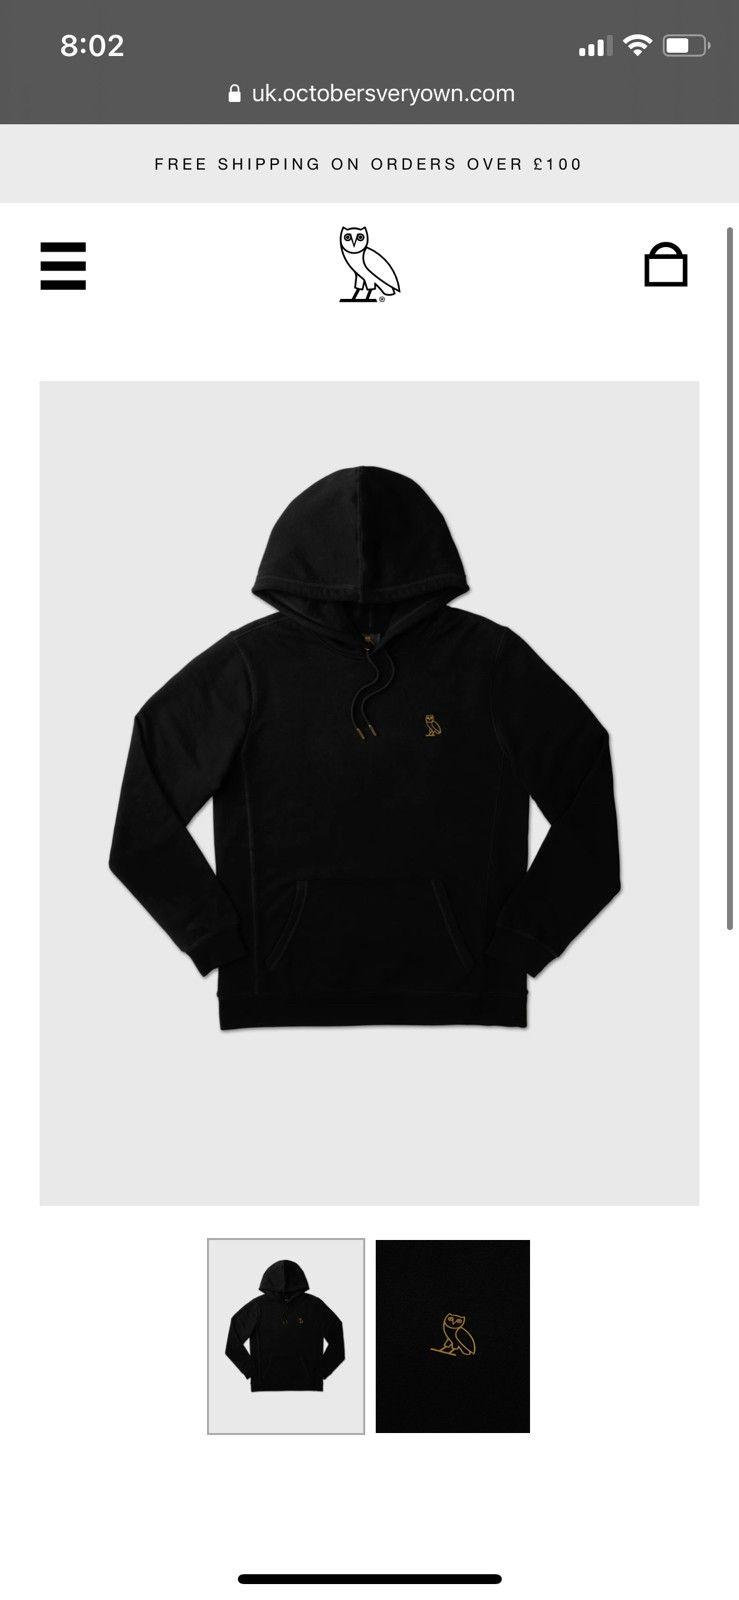 ovo hoodie | FINN.no